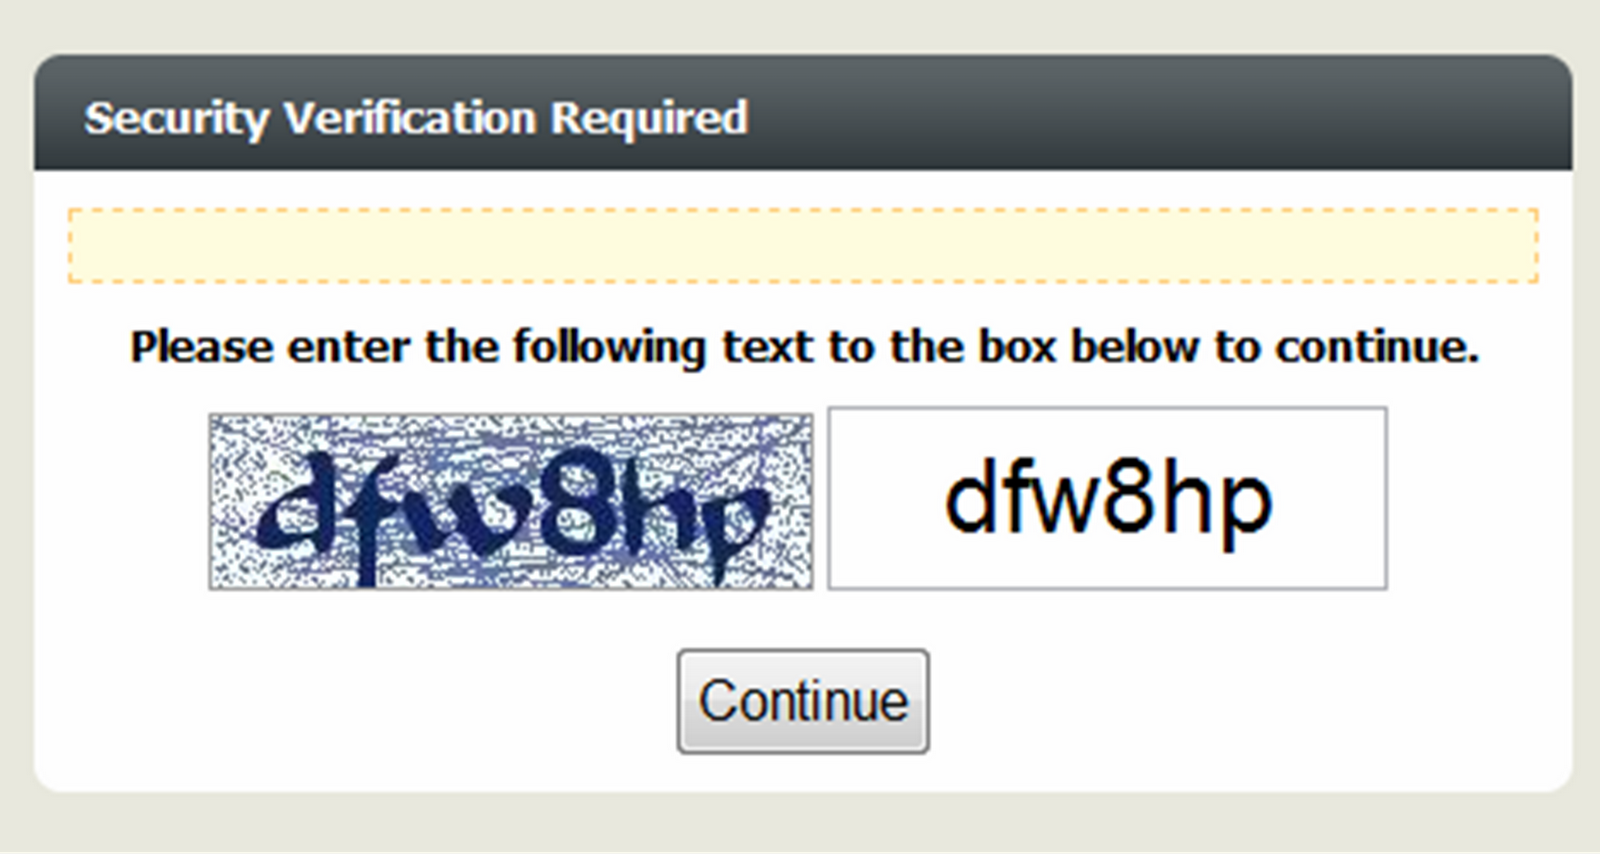 http://1.bp.blogspot.com/-cXBlCuIwHcc/T-gFZfexdqI/AAAAAAAAAUQ/XSZ_cnZn-rI/s1600/TGP+New+Verification+Code.png